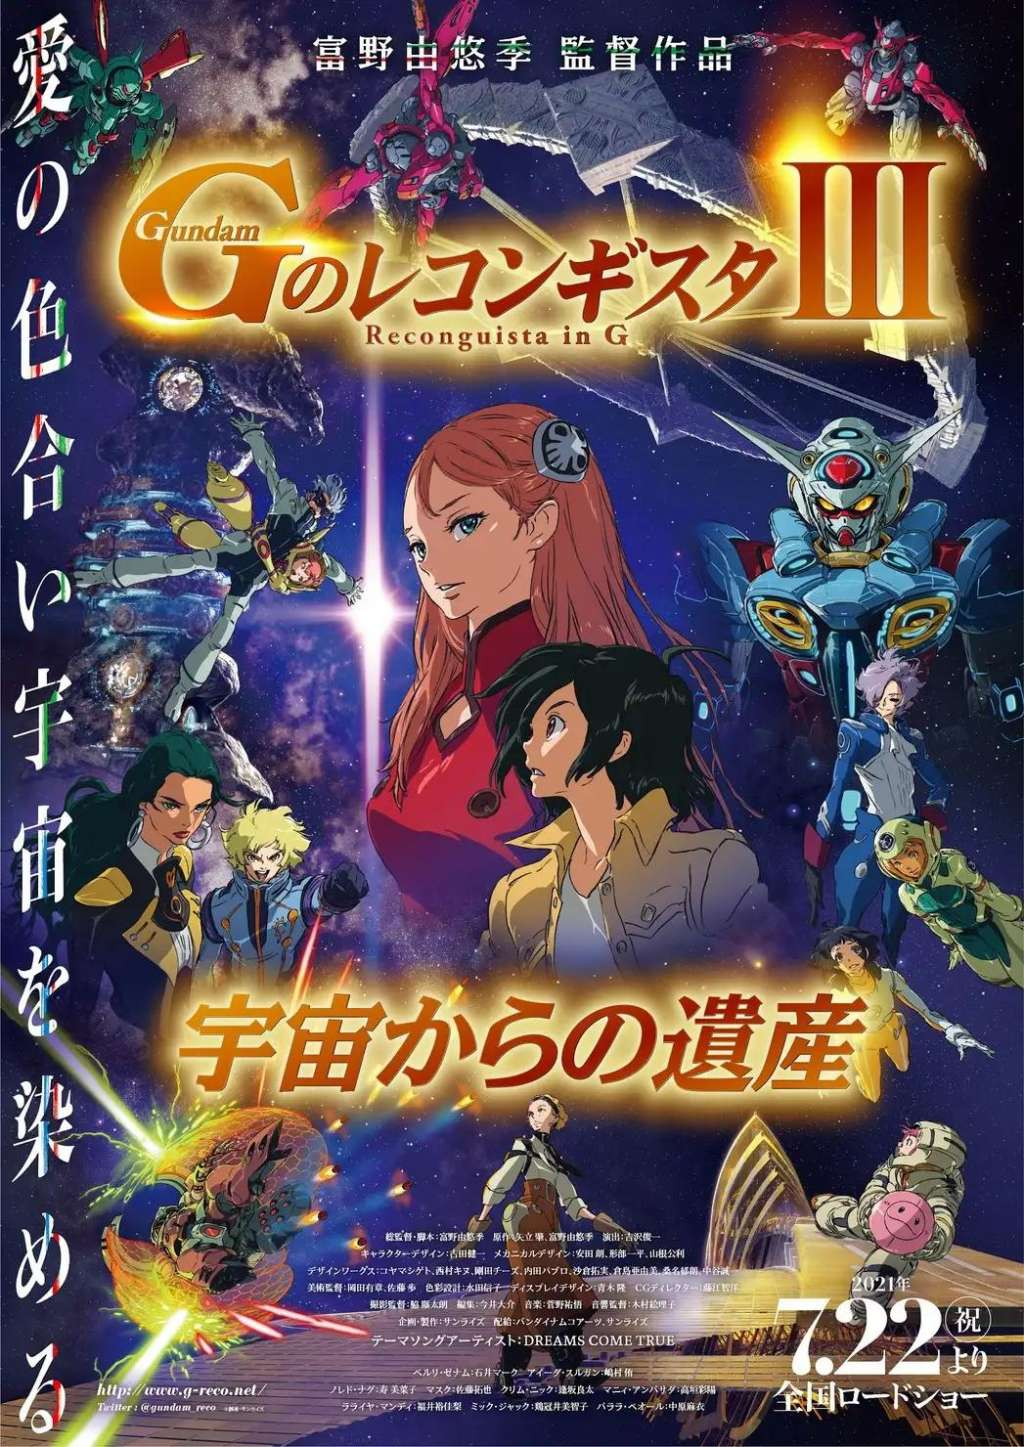 Gekijoban G No Reconguista III: Uchû kara no isan kapak